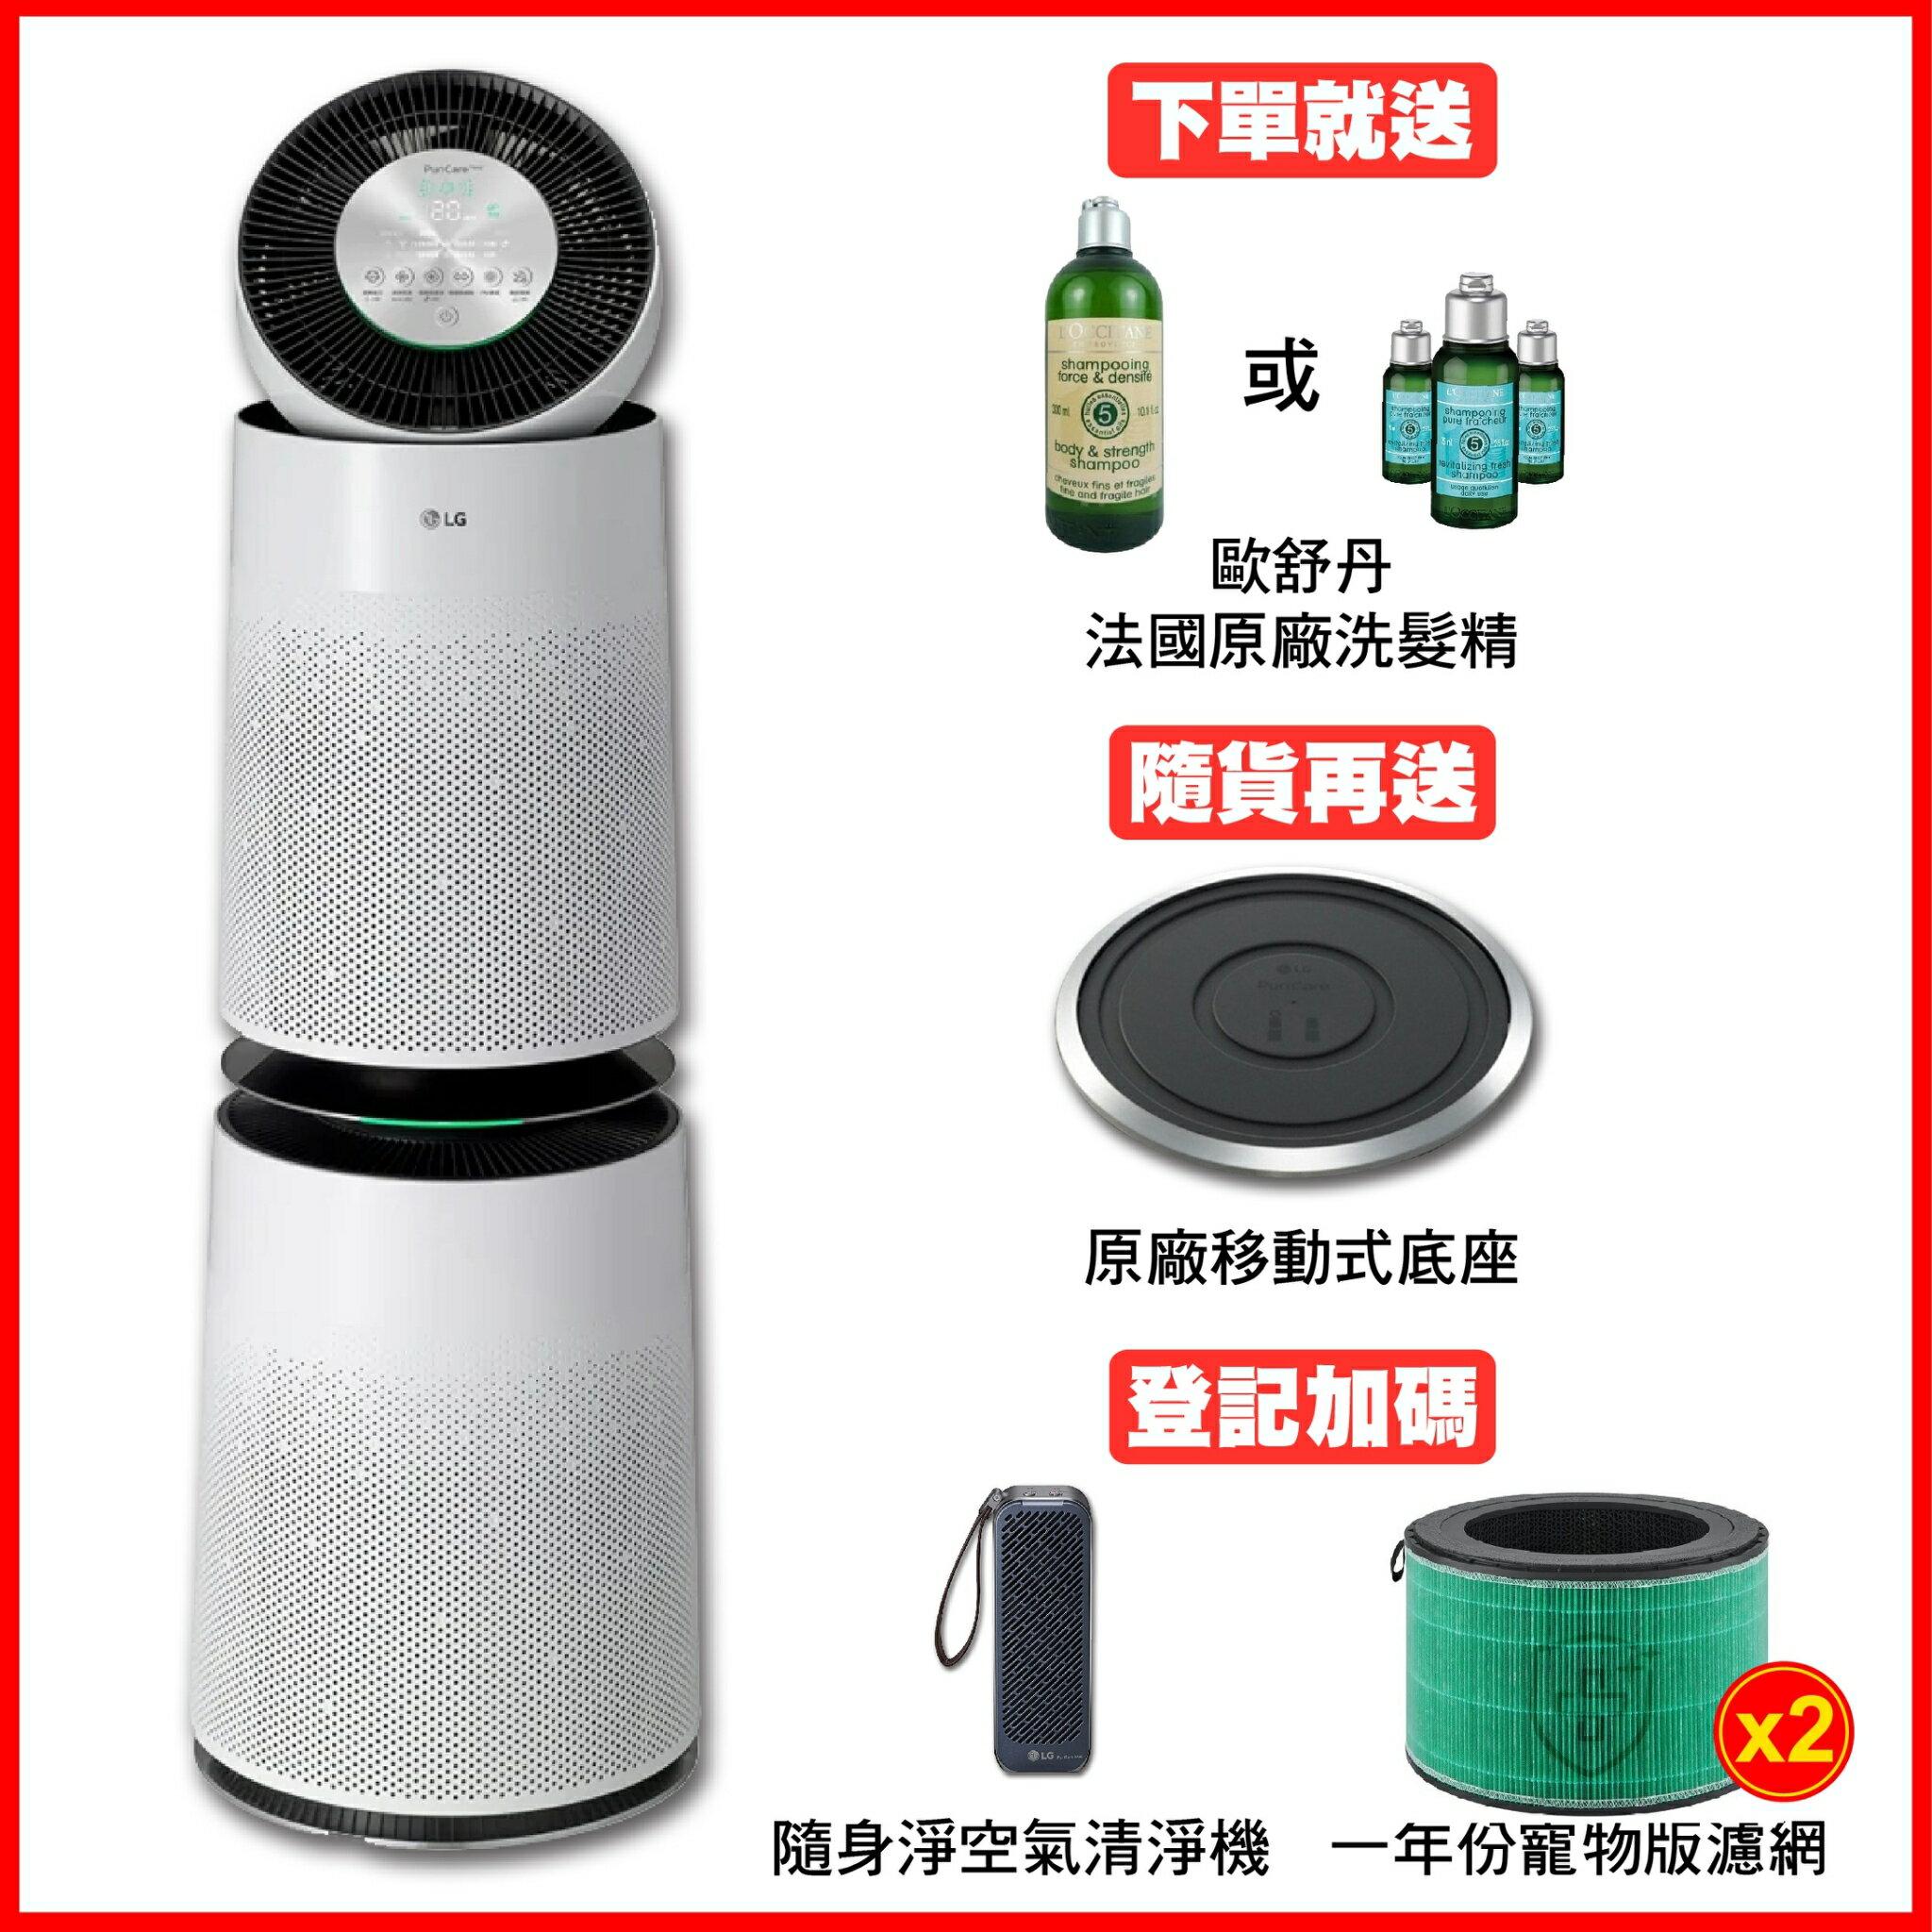 LG 樂金 PuriCare™360空氣清淨機 2.0 AS101DWH0 原廠保固 結帳更優惠 黑皮TIME